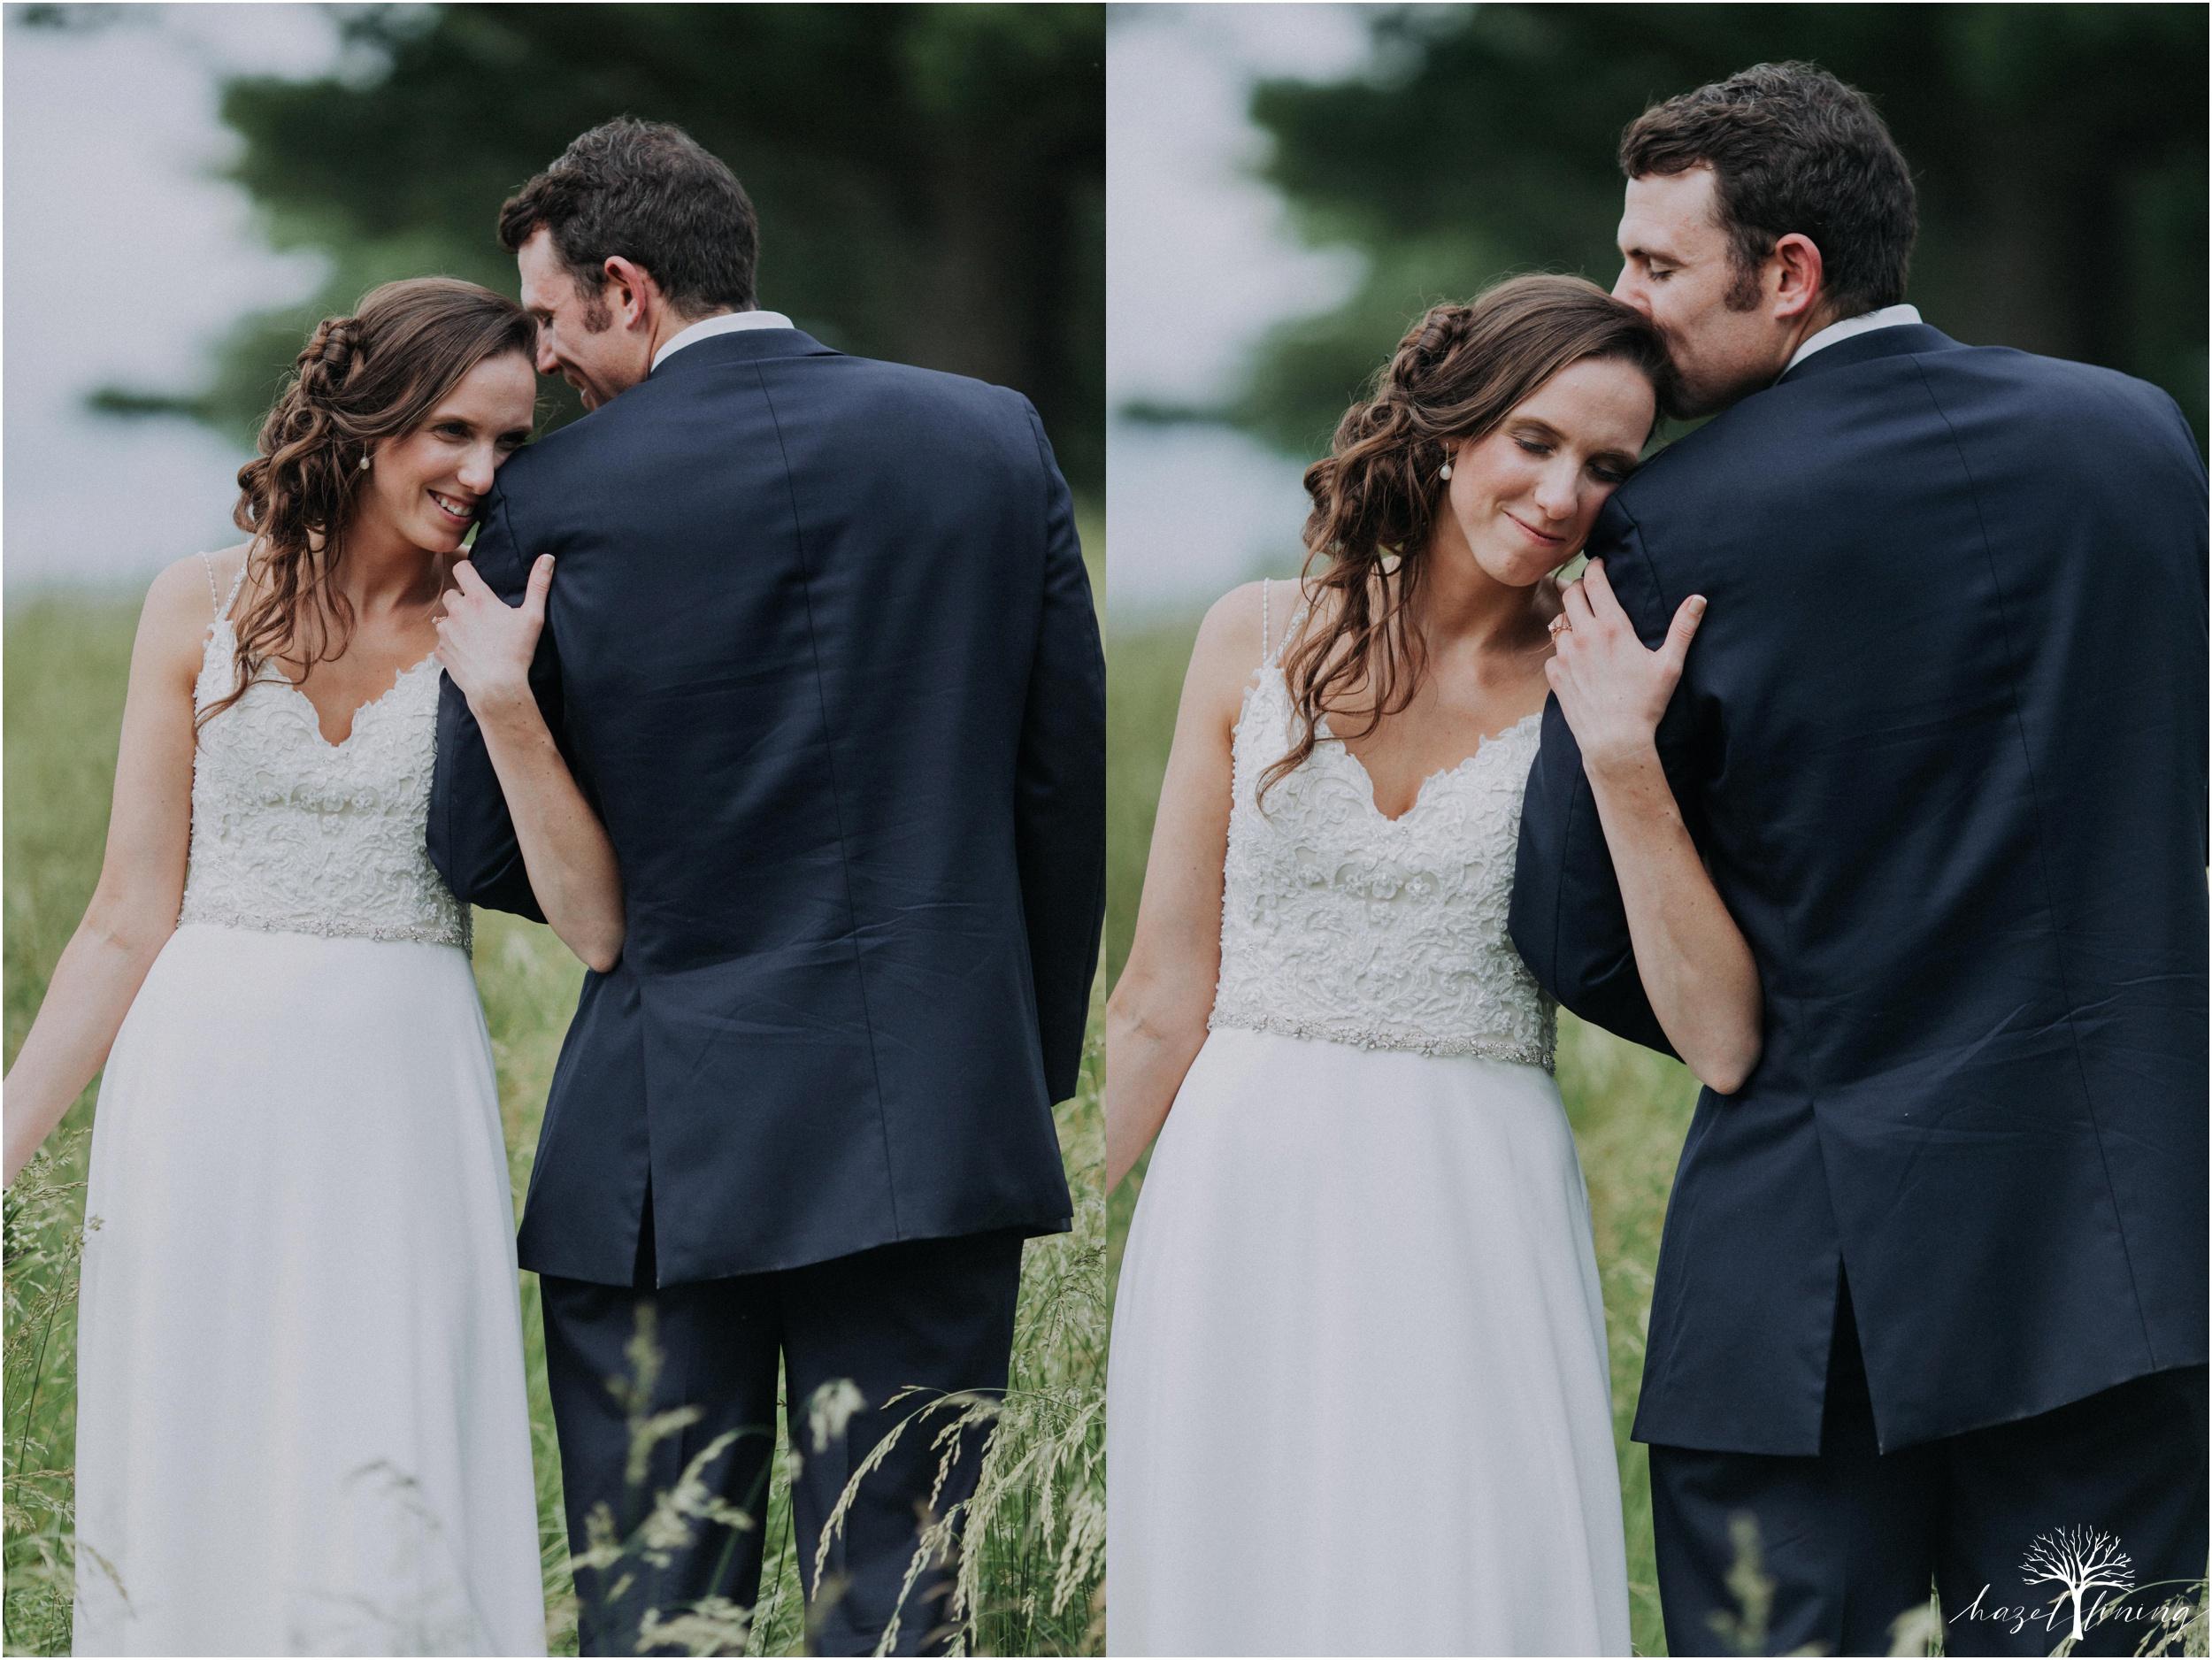 hazel-lining-travel-wedding-elopement-photography_0099.jpg